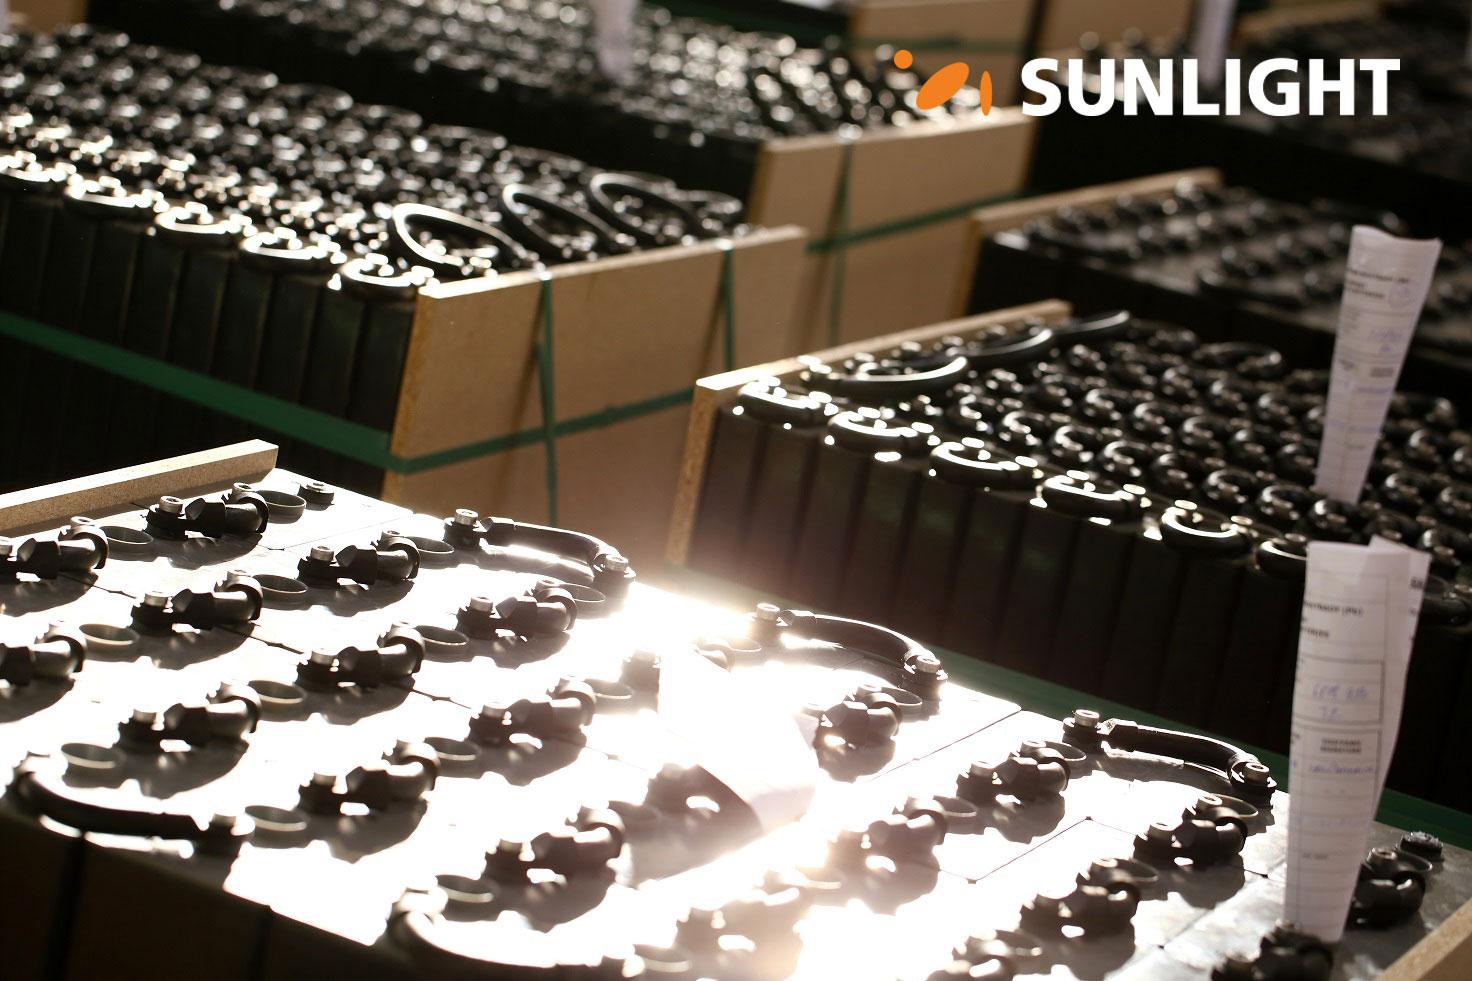 Sunlight: Θετικά οικονομικά αποτελέσματα, νέες παραγωγικές εγκαταστάσεις και επιπλέον επενδύσεις